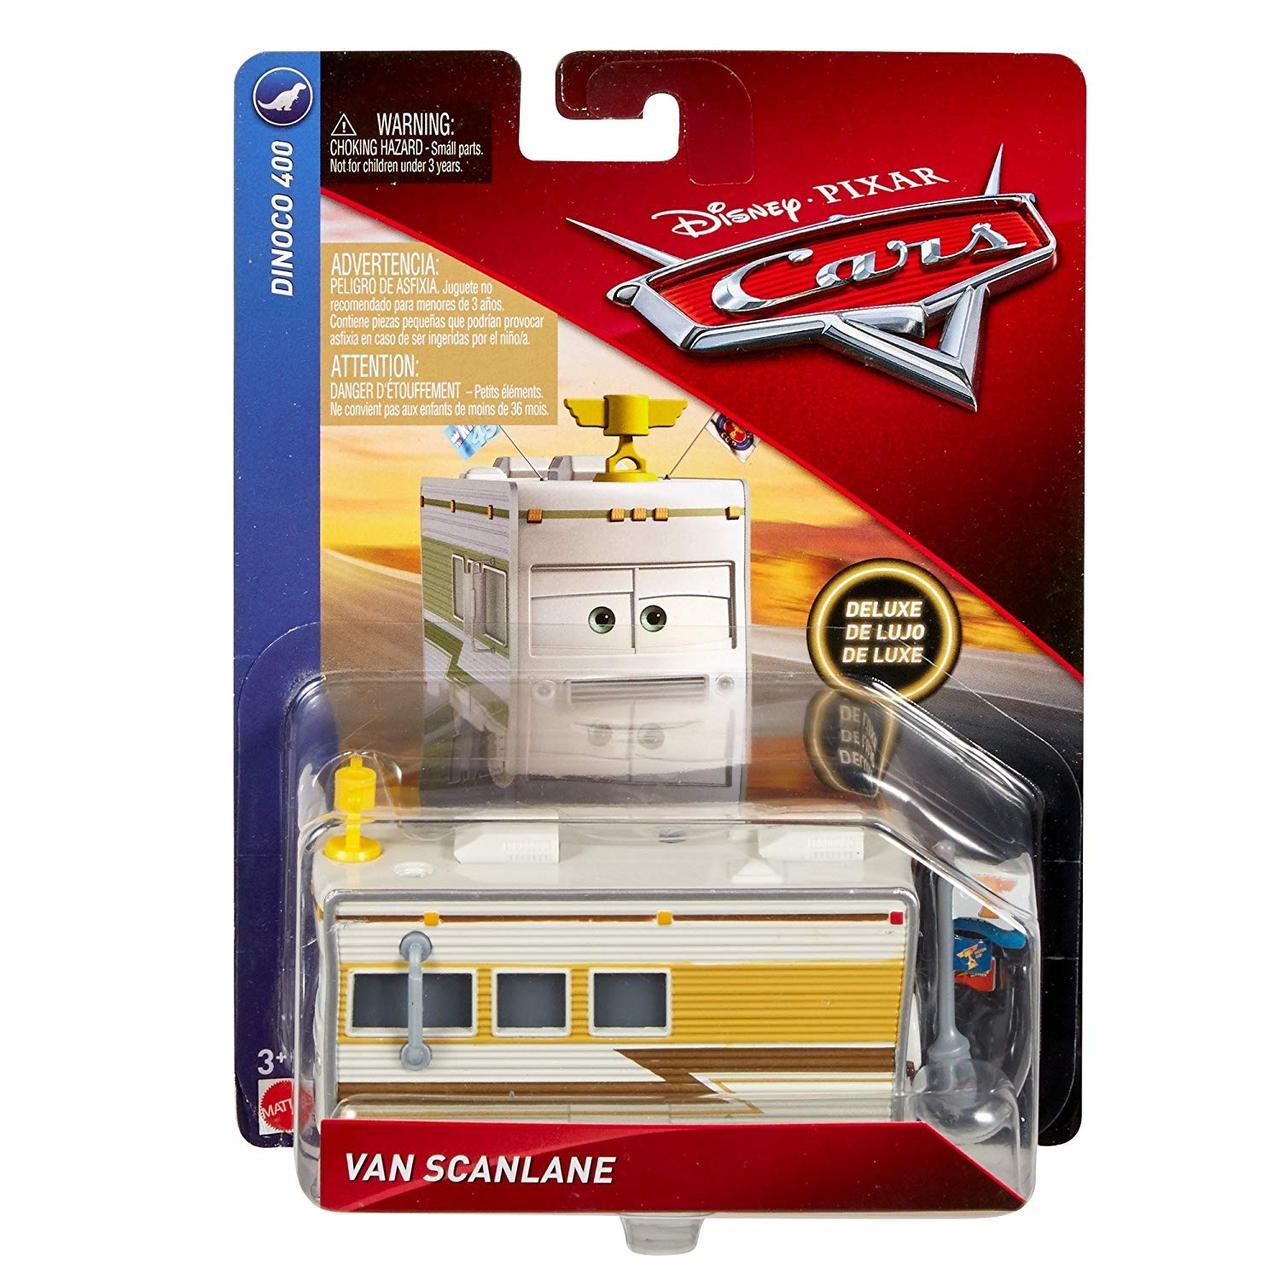 Тачки 3 (Cars Disney Pixar Cars Van Scanlane) Ван Сканлейн от Mattel